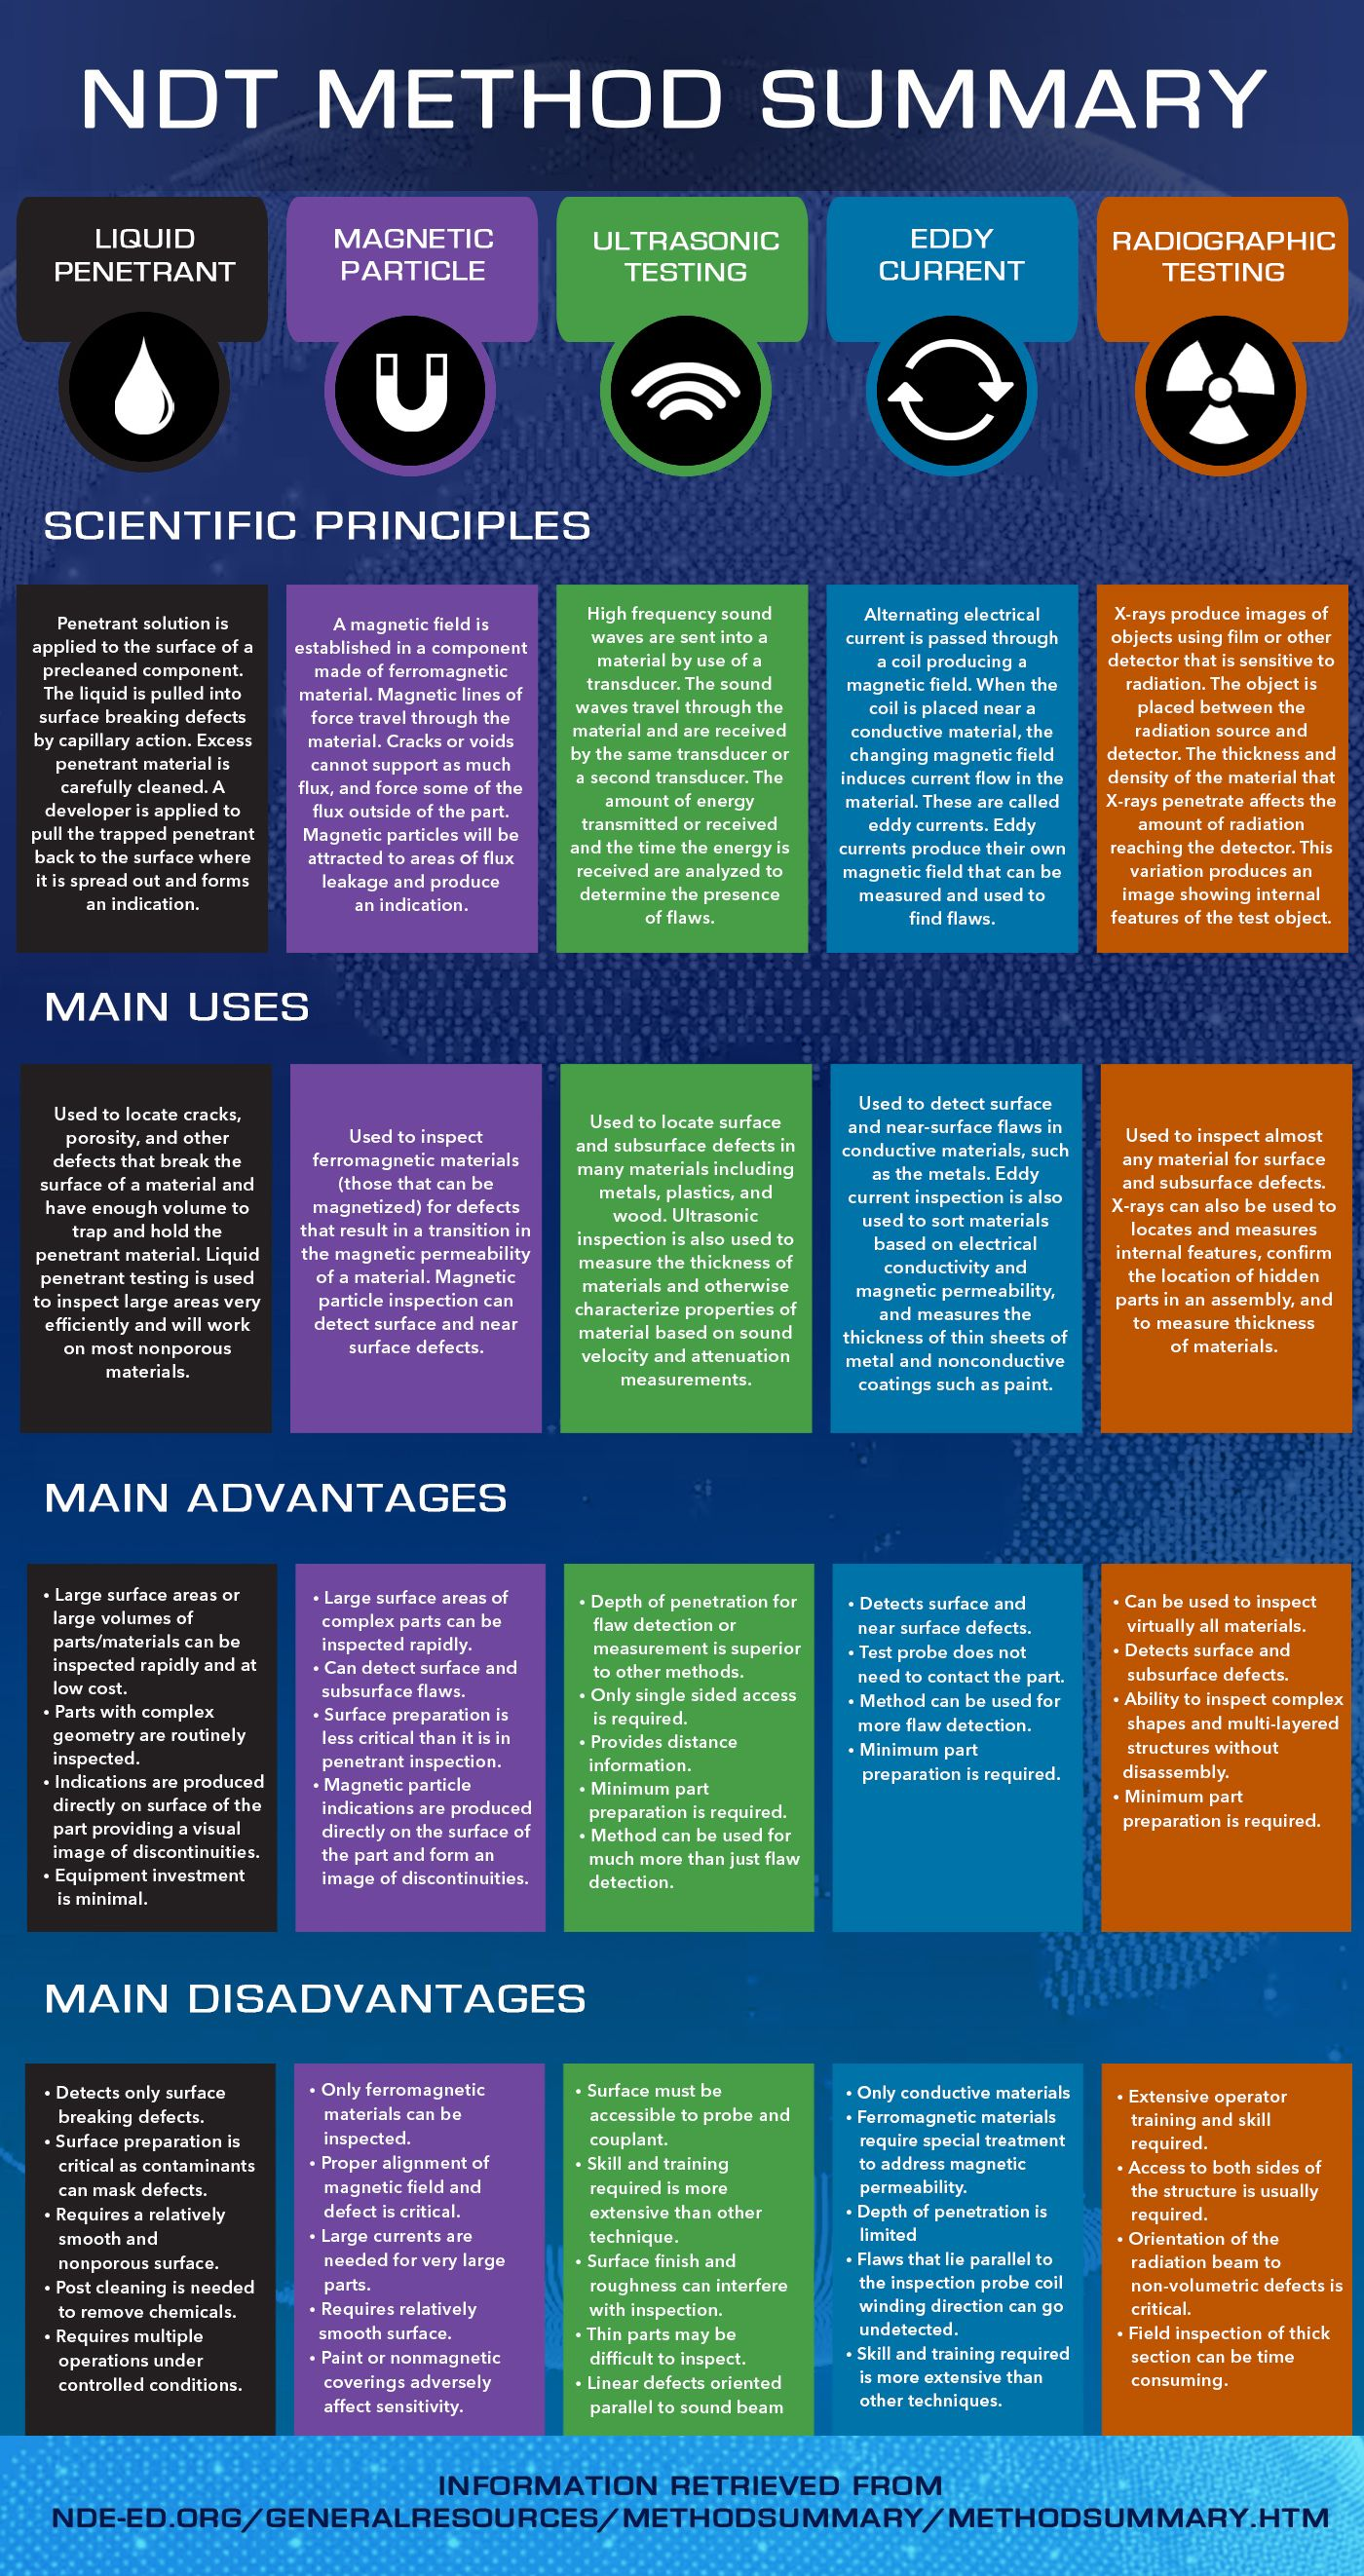 This Table Summarizes The Scientific Principles Uses Advantages